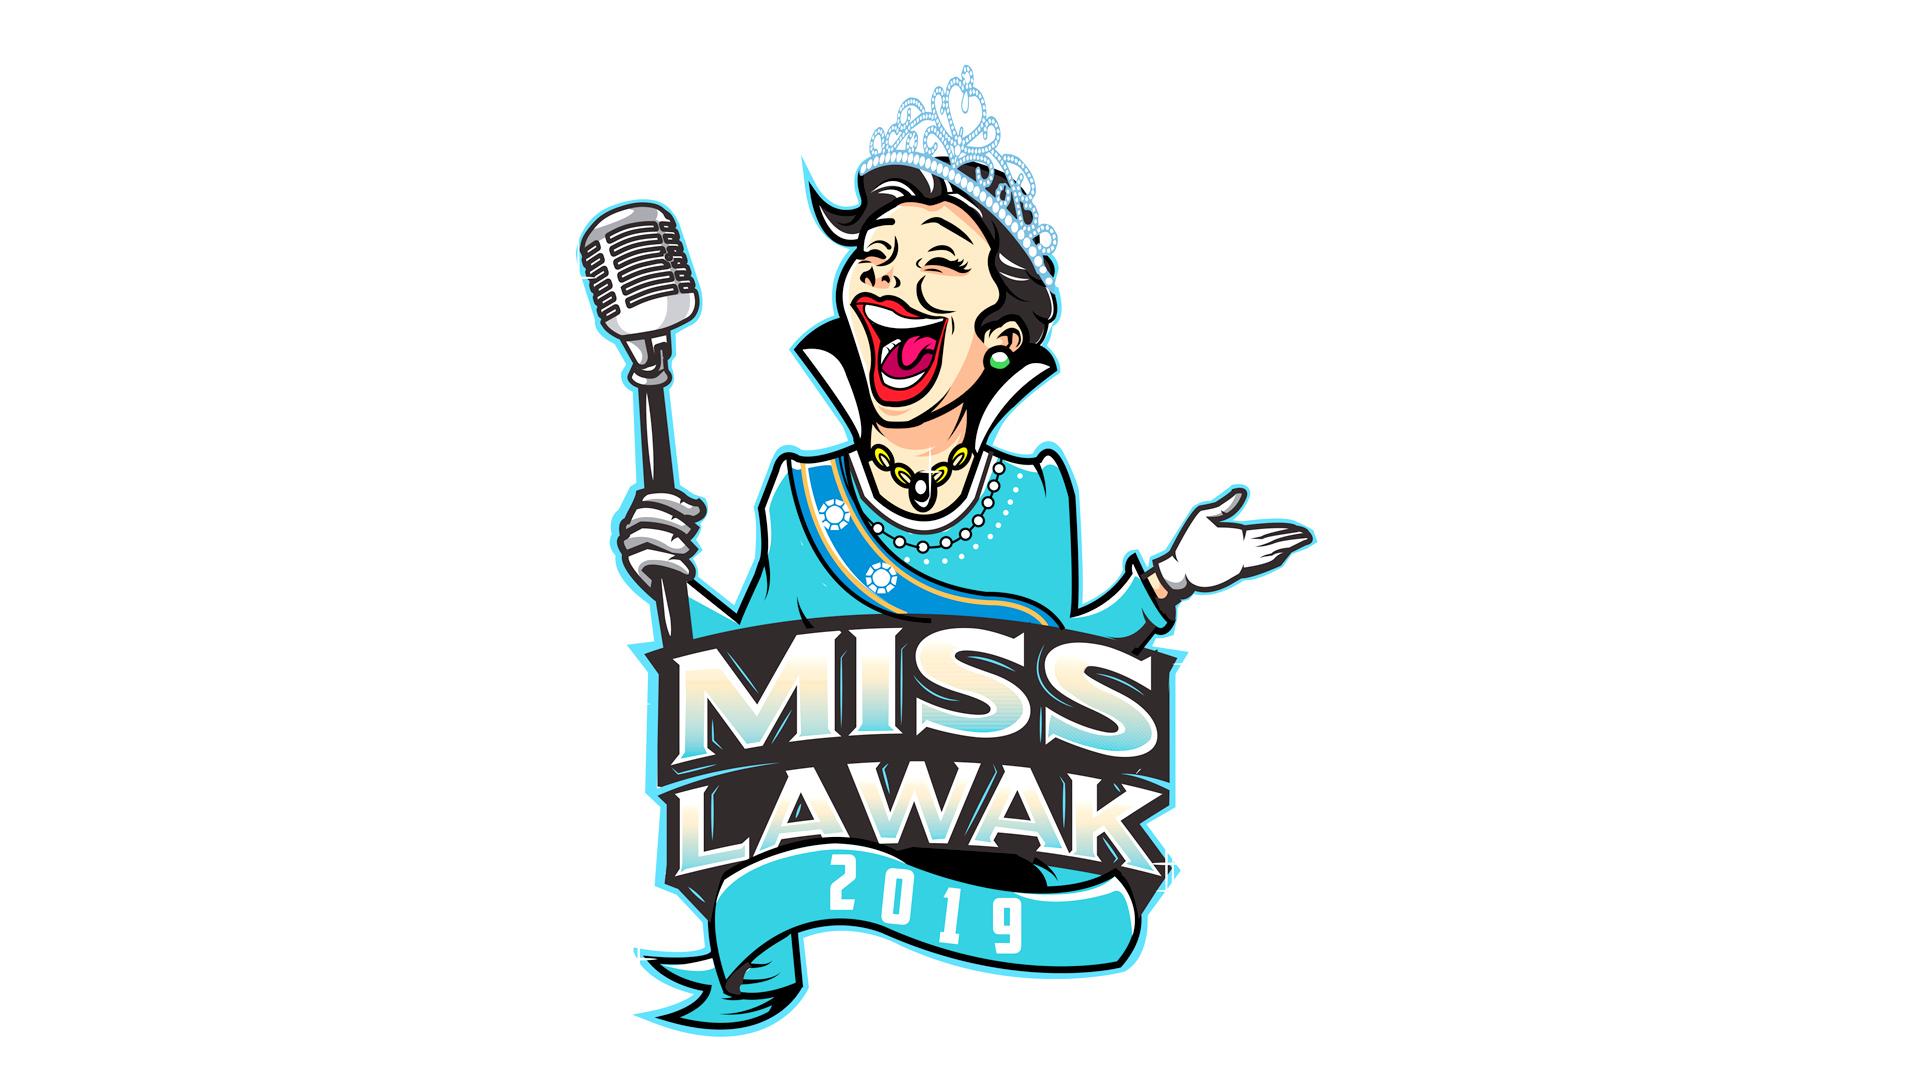 MISS LAWAK